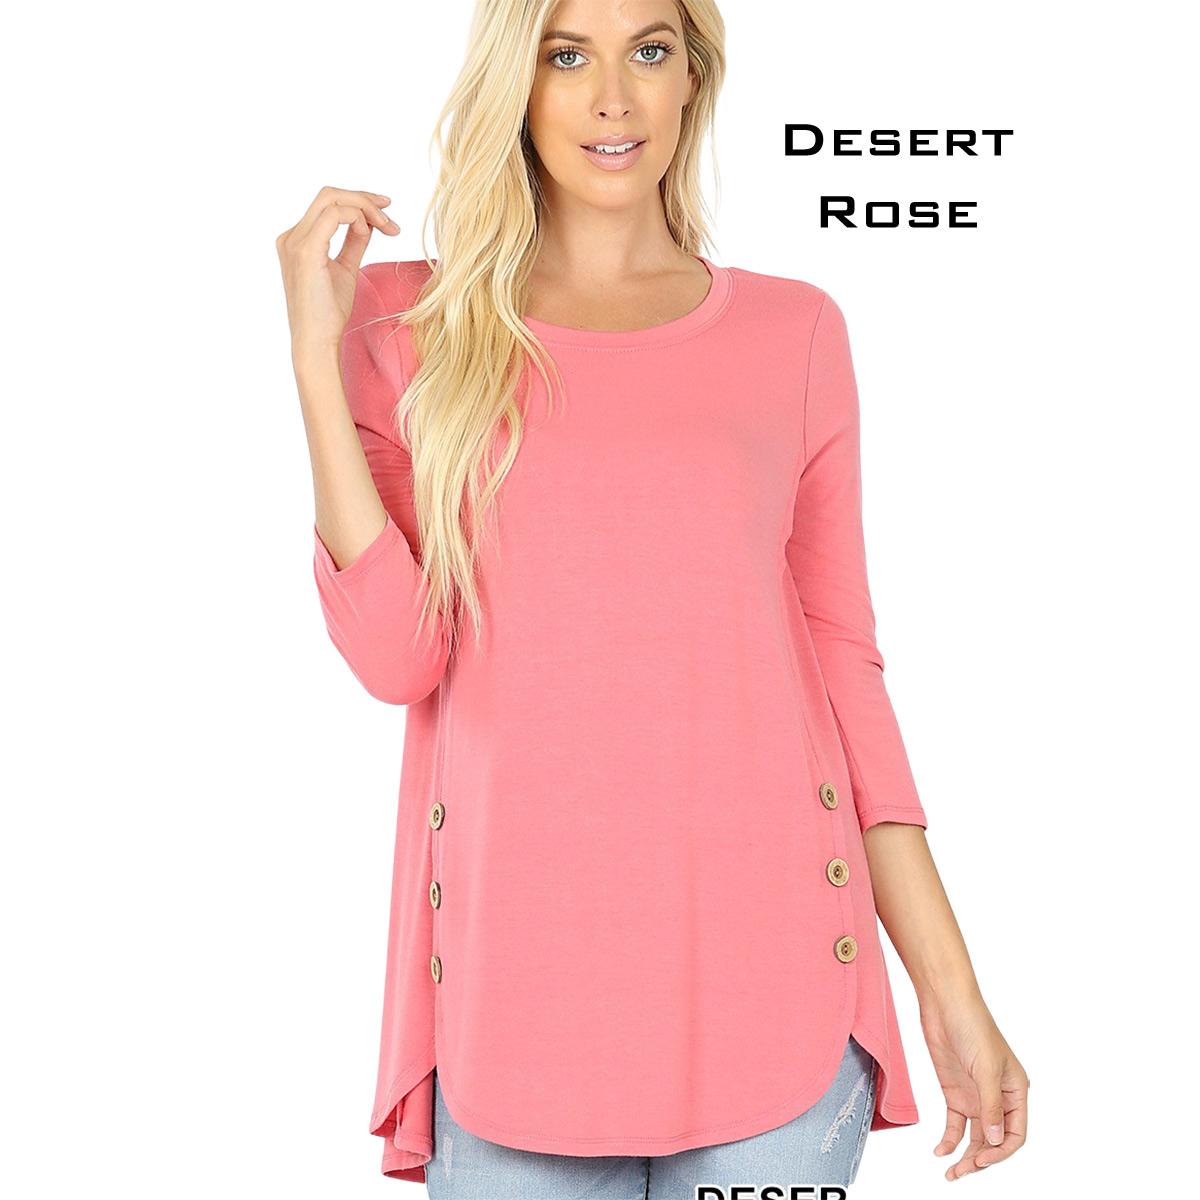 DESERT ROSE 3/4 Sleeve Side Wood Buttons Top 2032